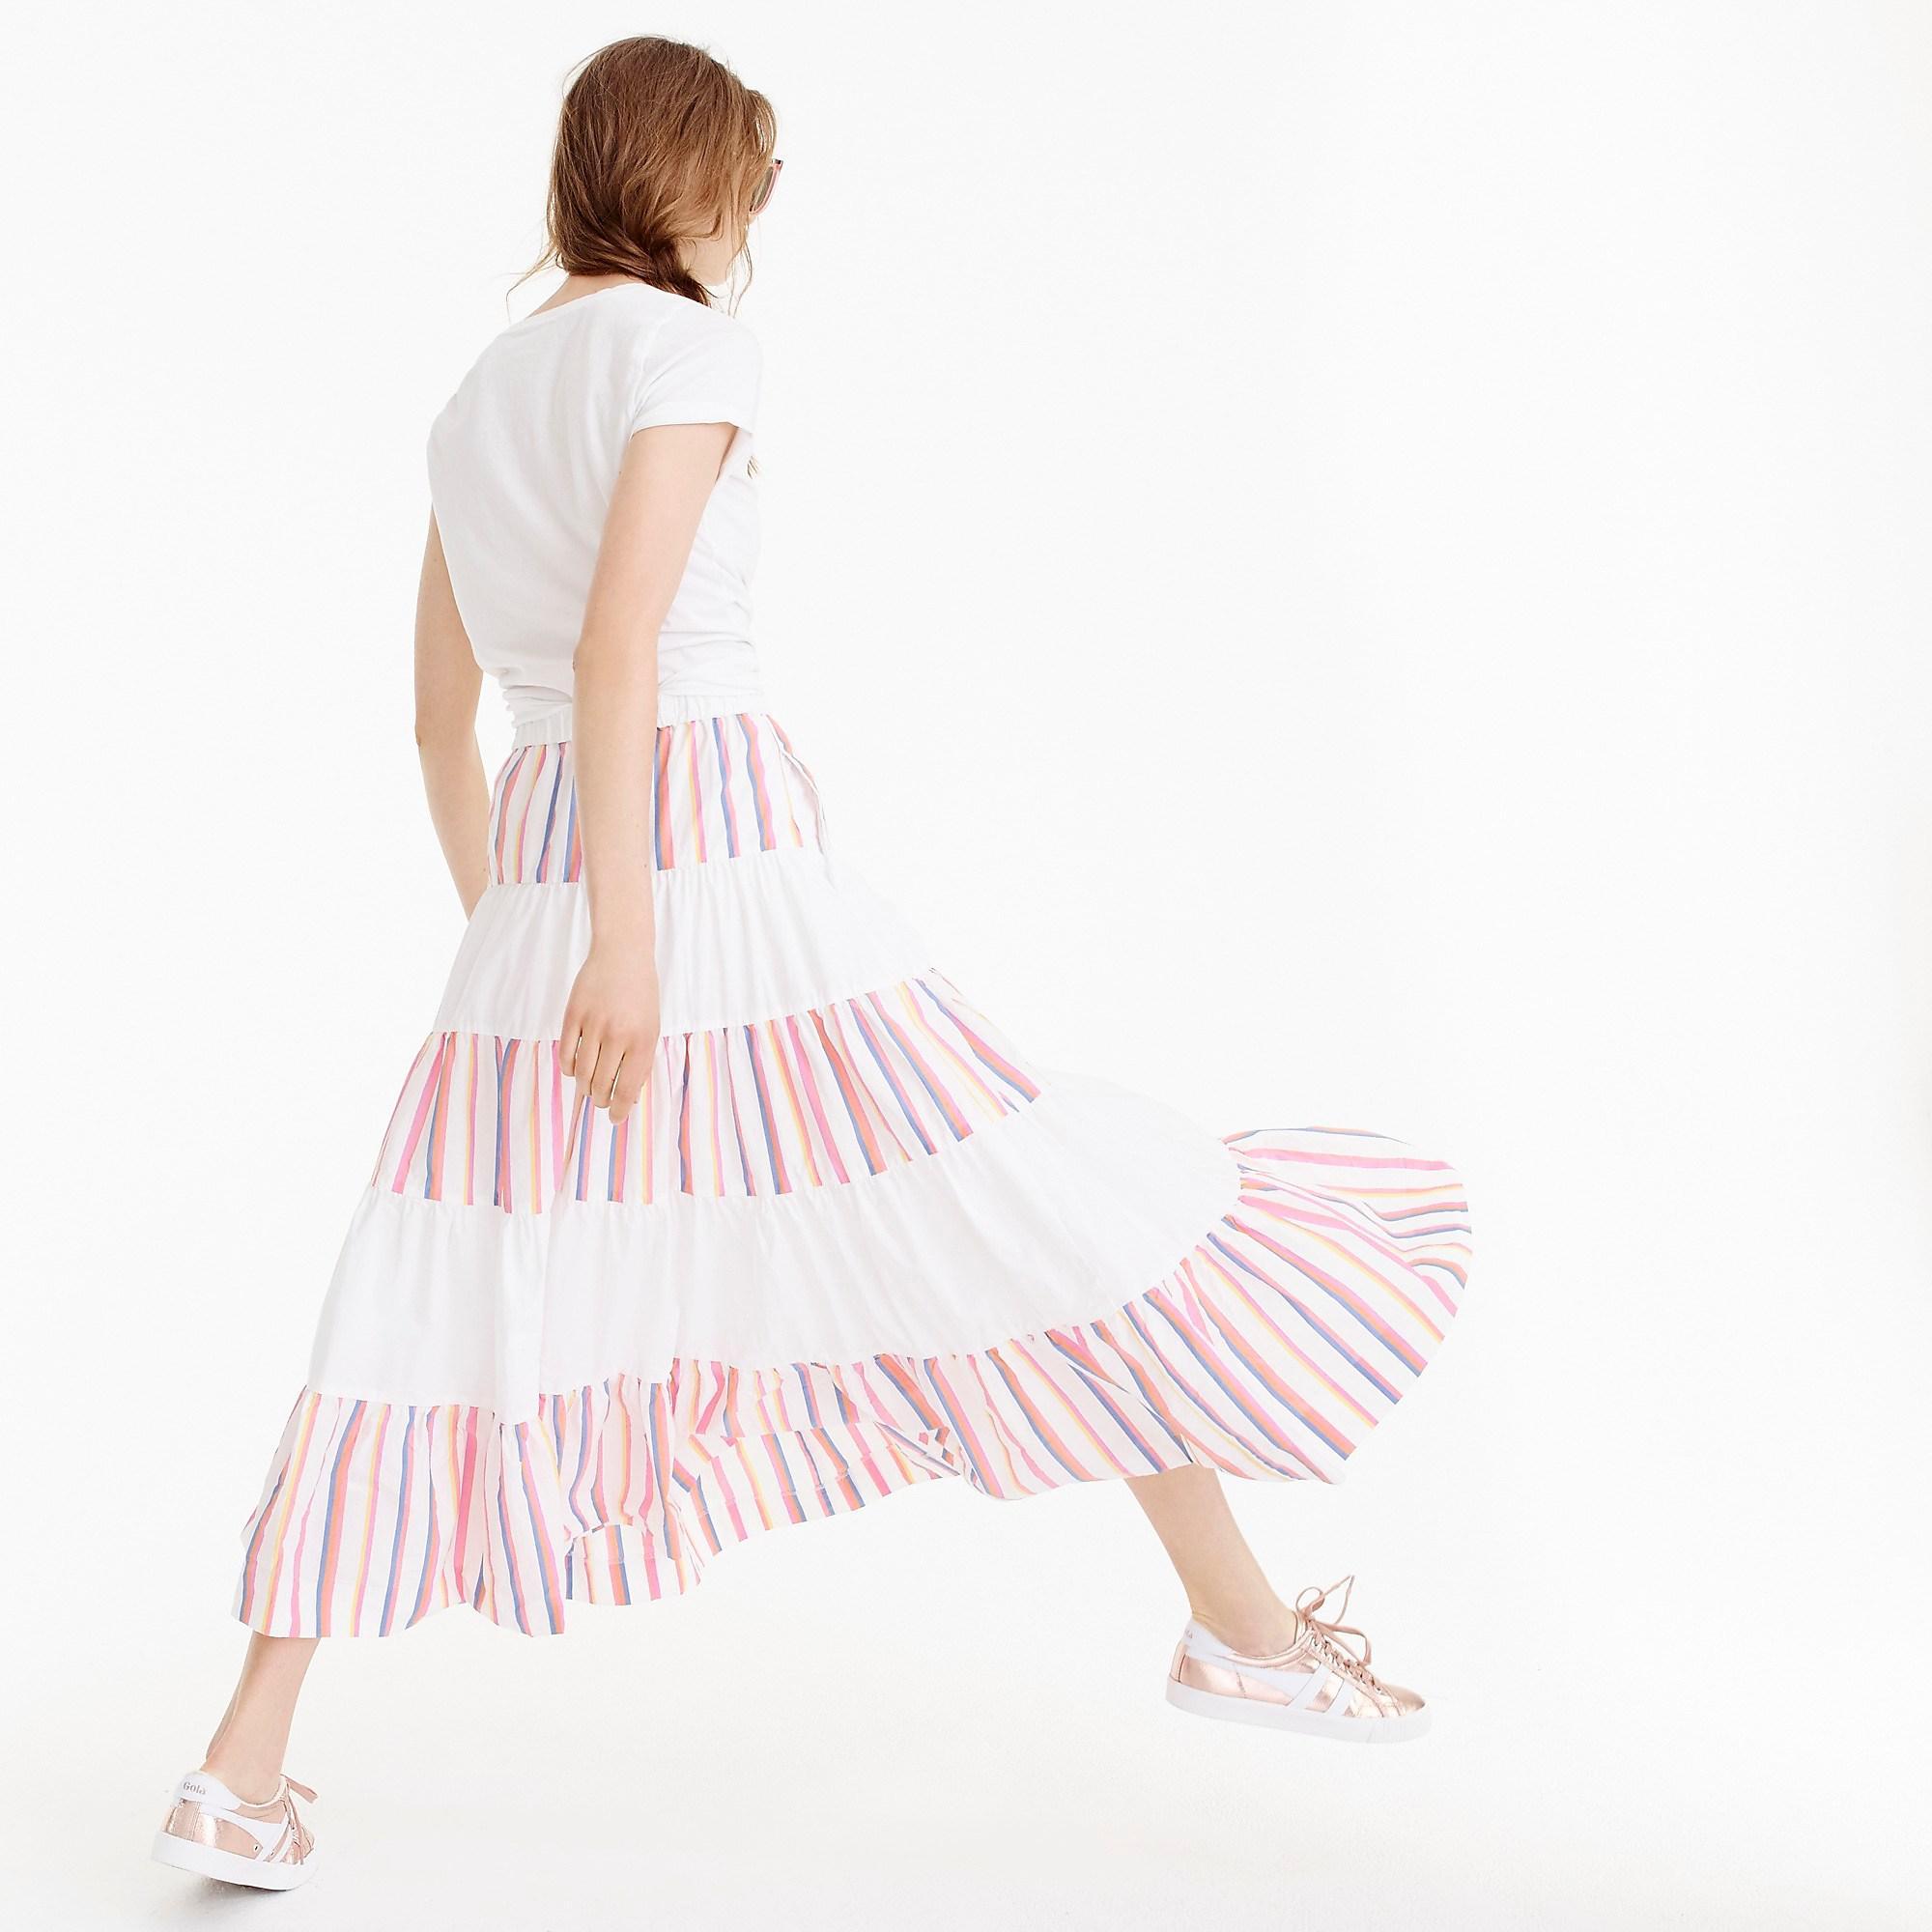 d50342c1f J.Crew Tiered Midi Skirt In Sorbet Stripe in Pink - Lyst